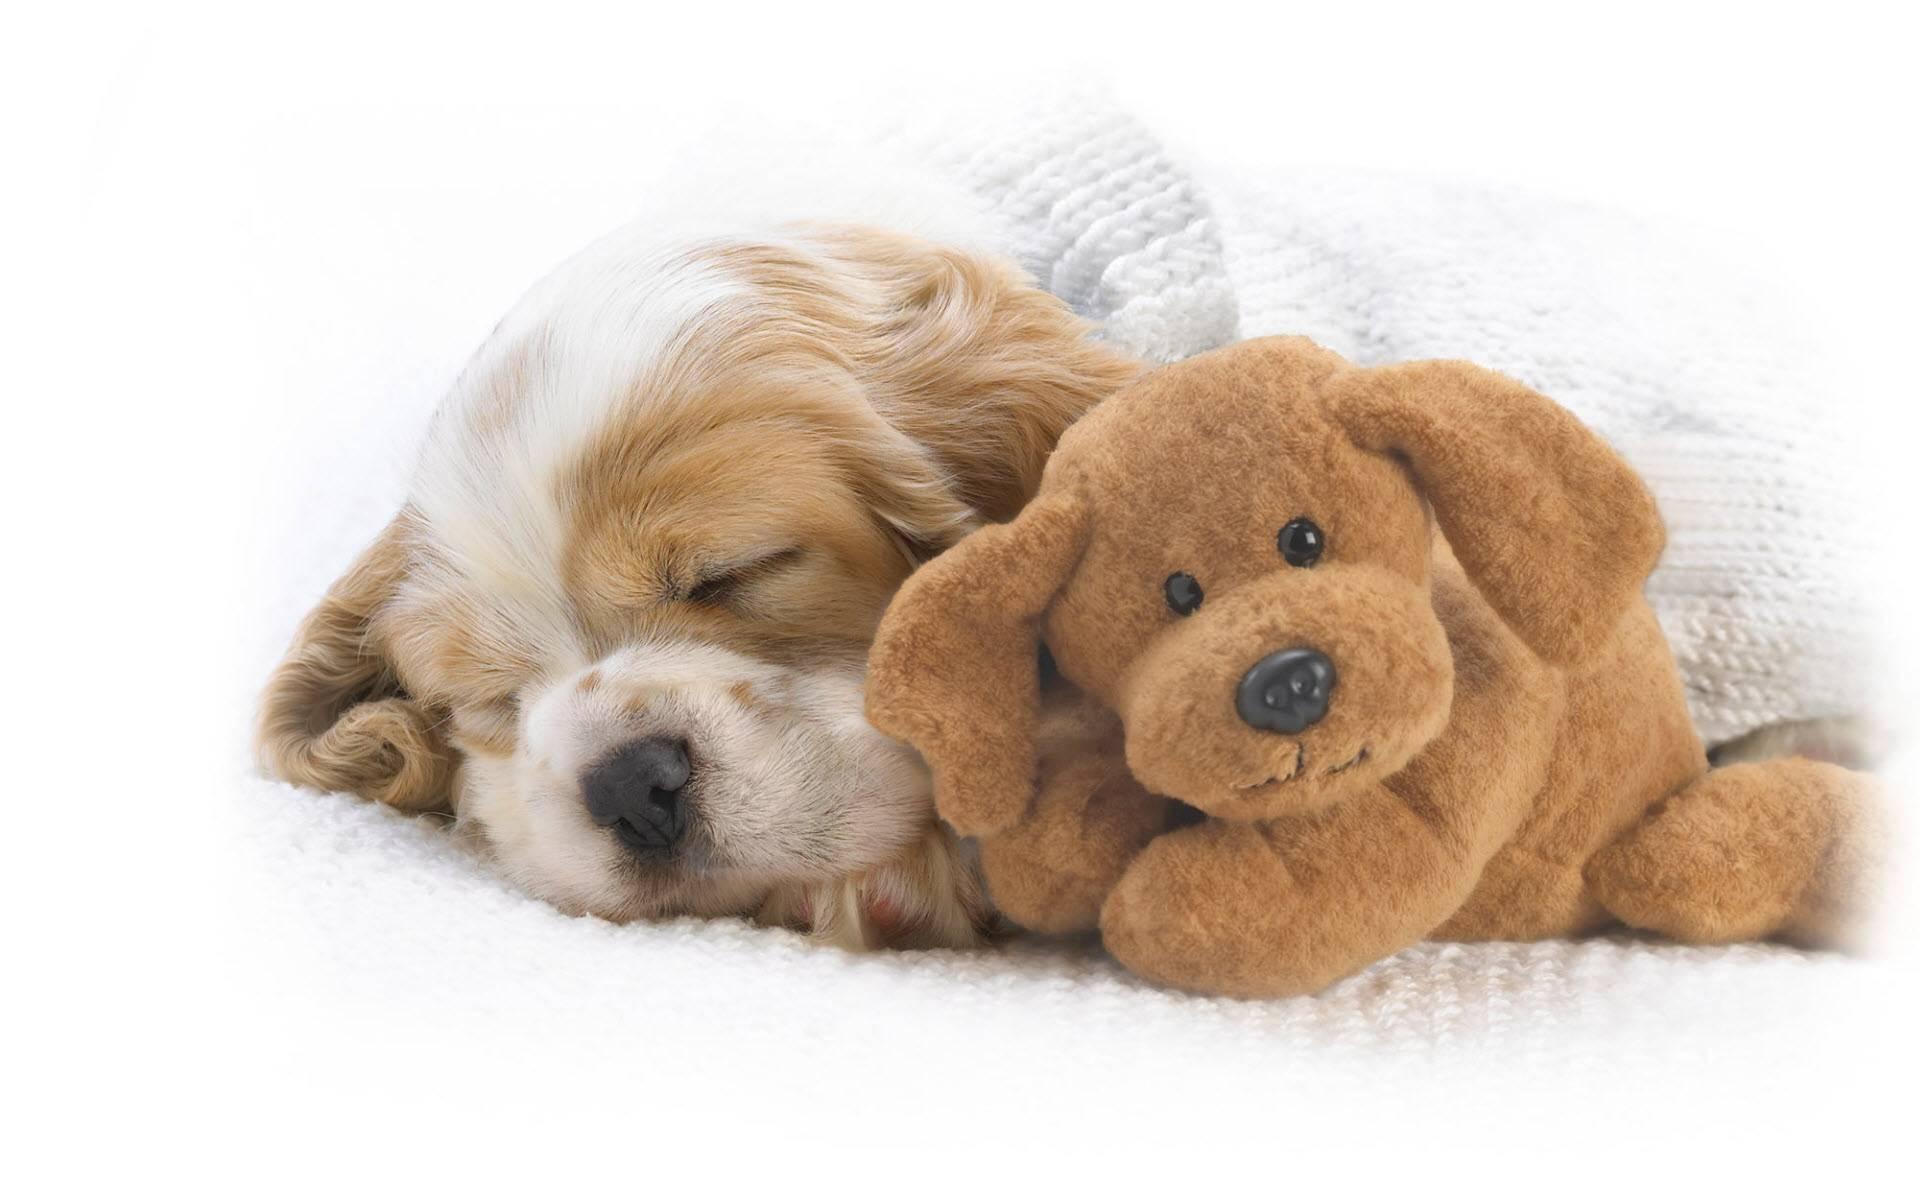 wallpaper image dog puppy cute 1920x1200 1920x1200